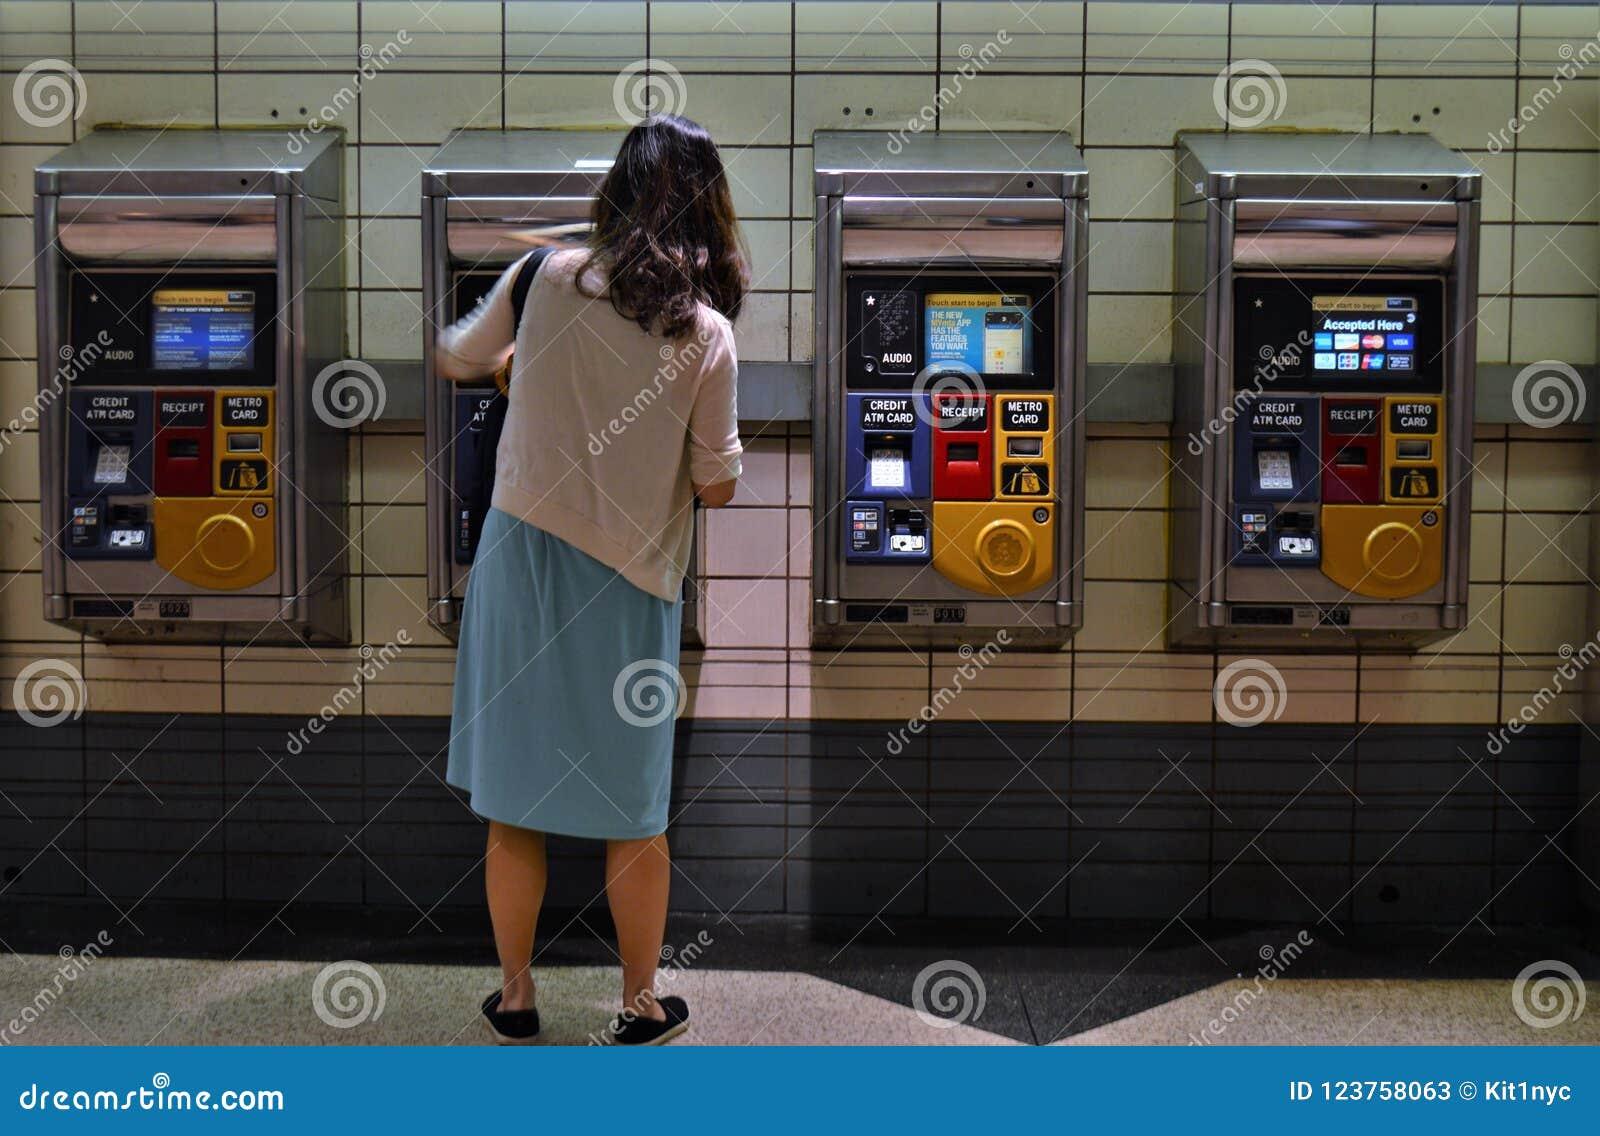 New York City MTA Subway Metro Card Vending Machine People ...